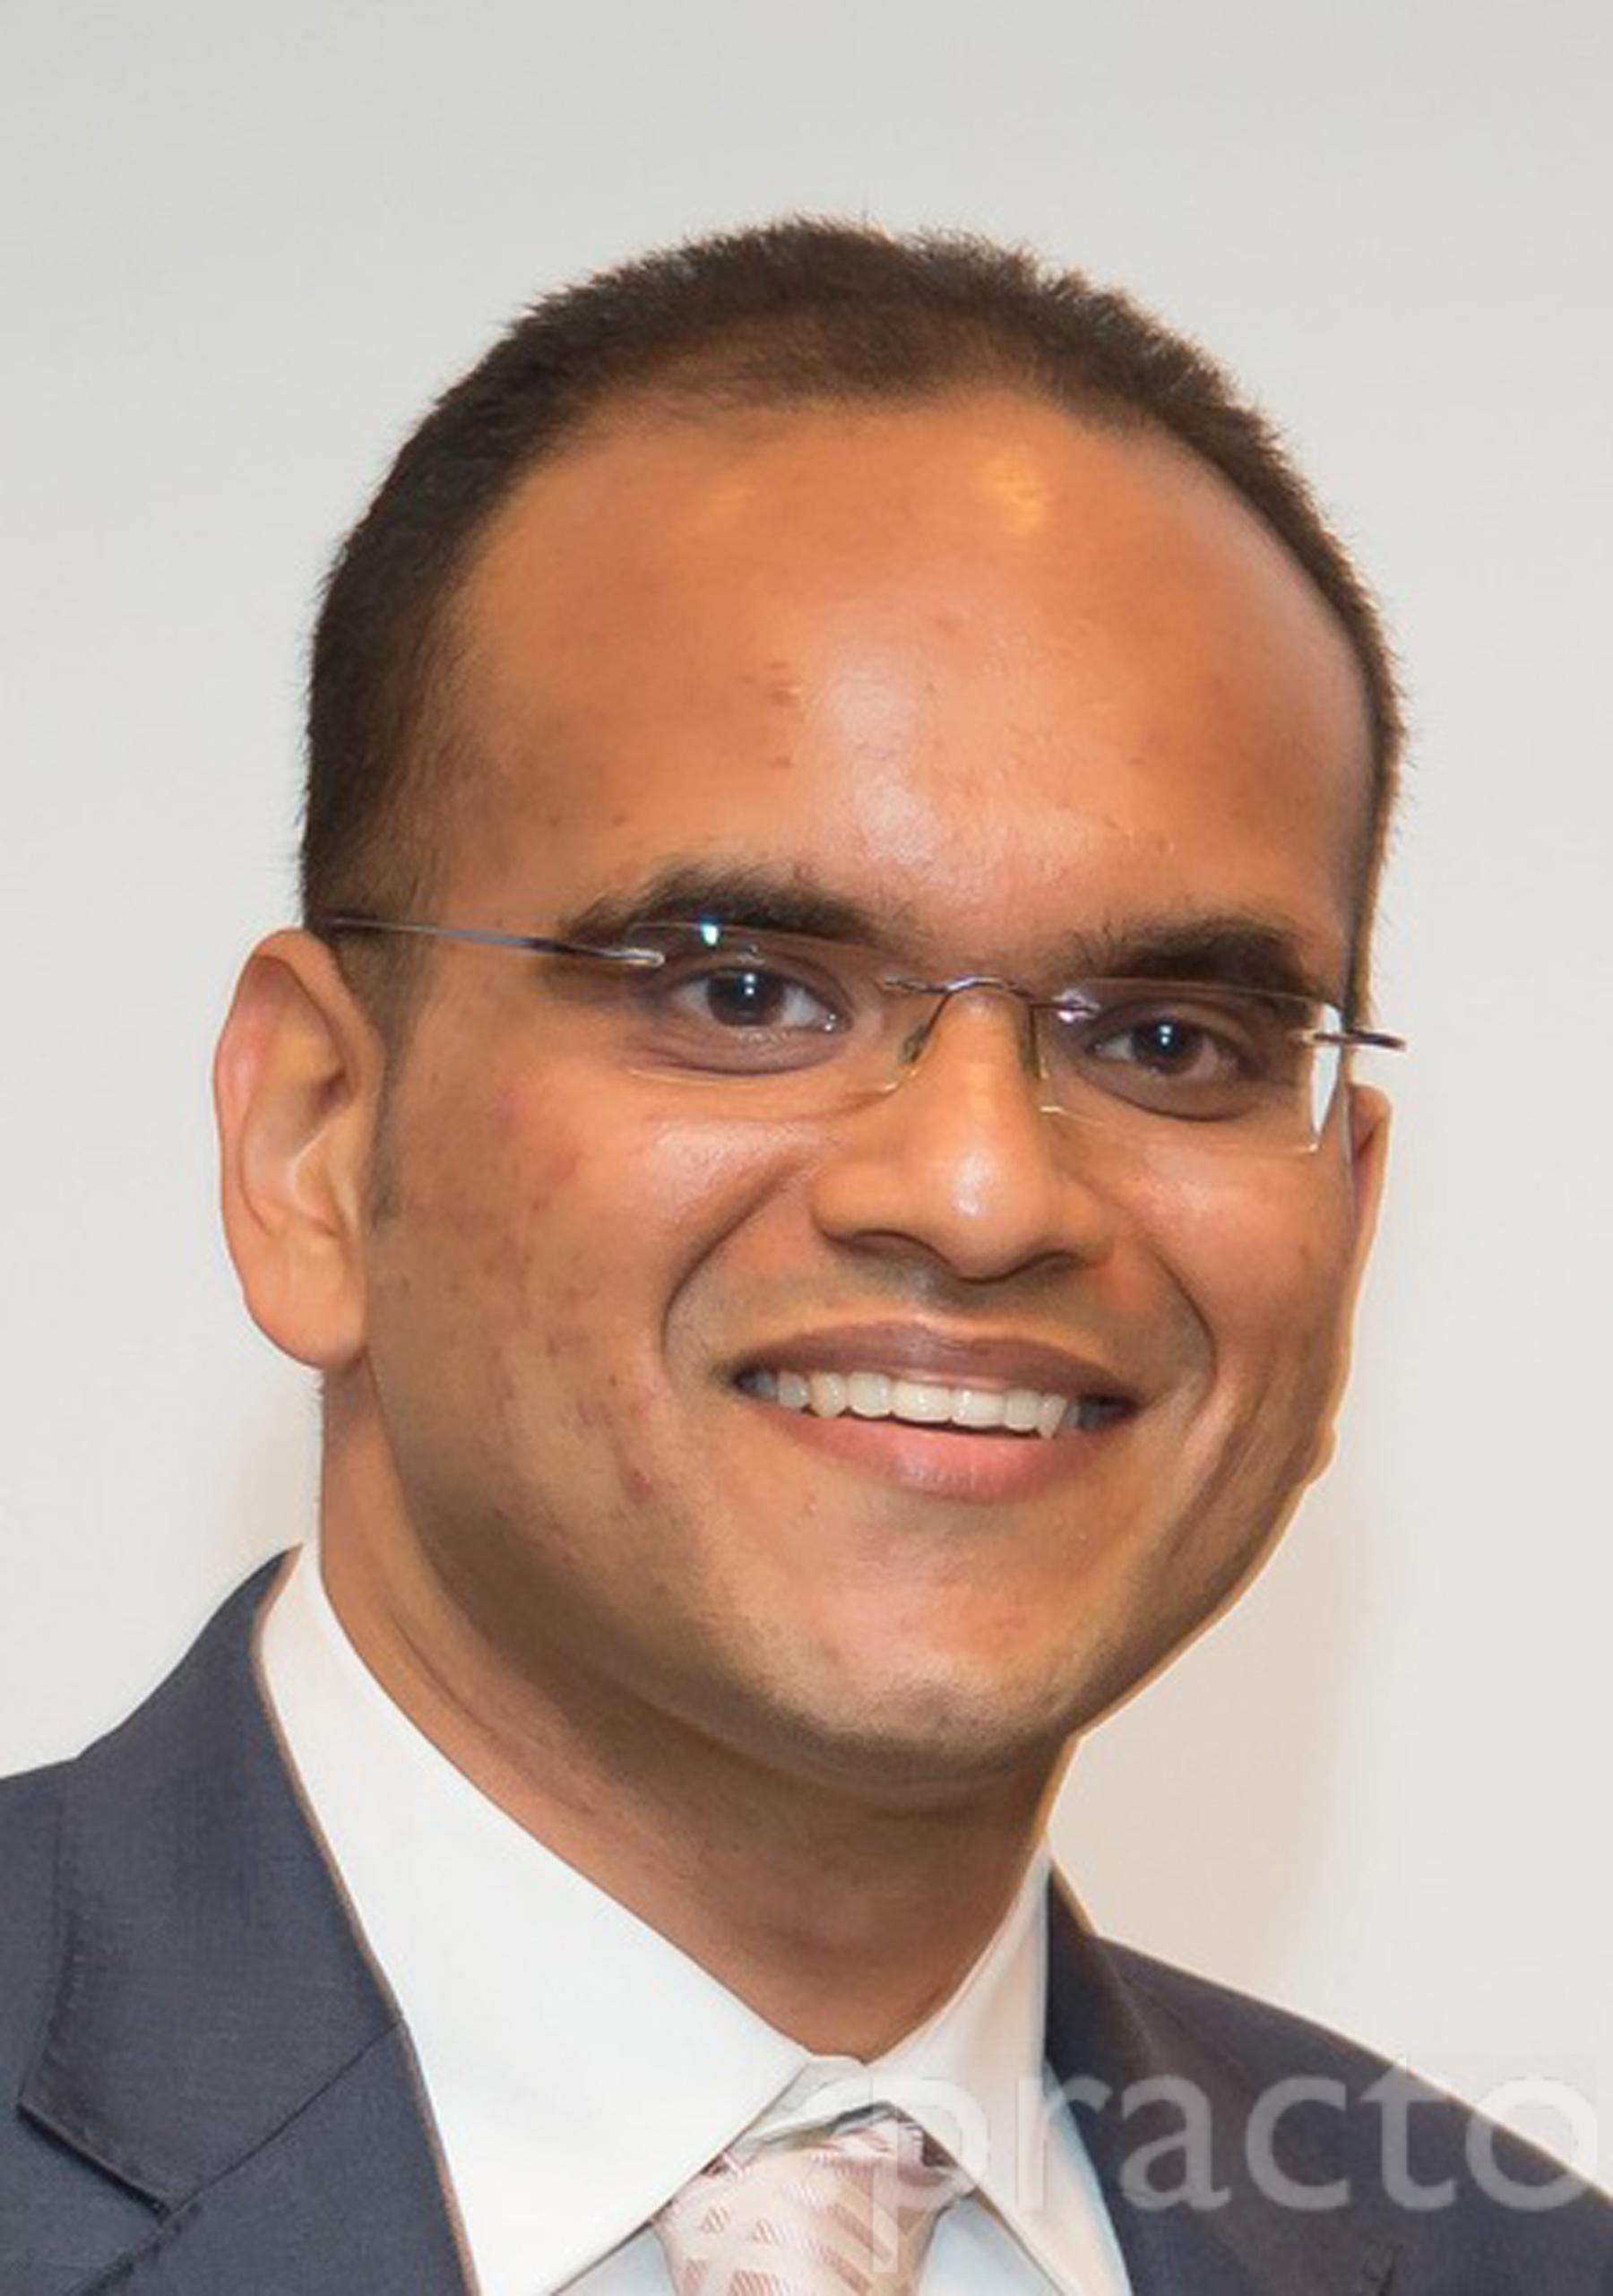 Dr. Hasanain Shikari - Ophthalmologist